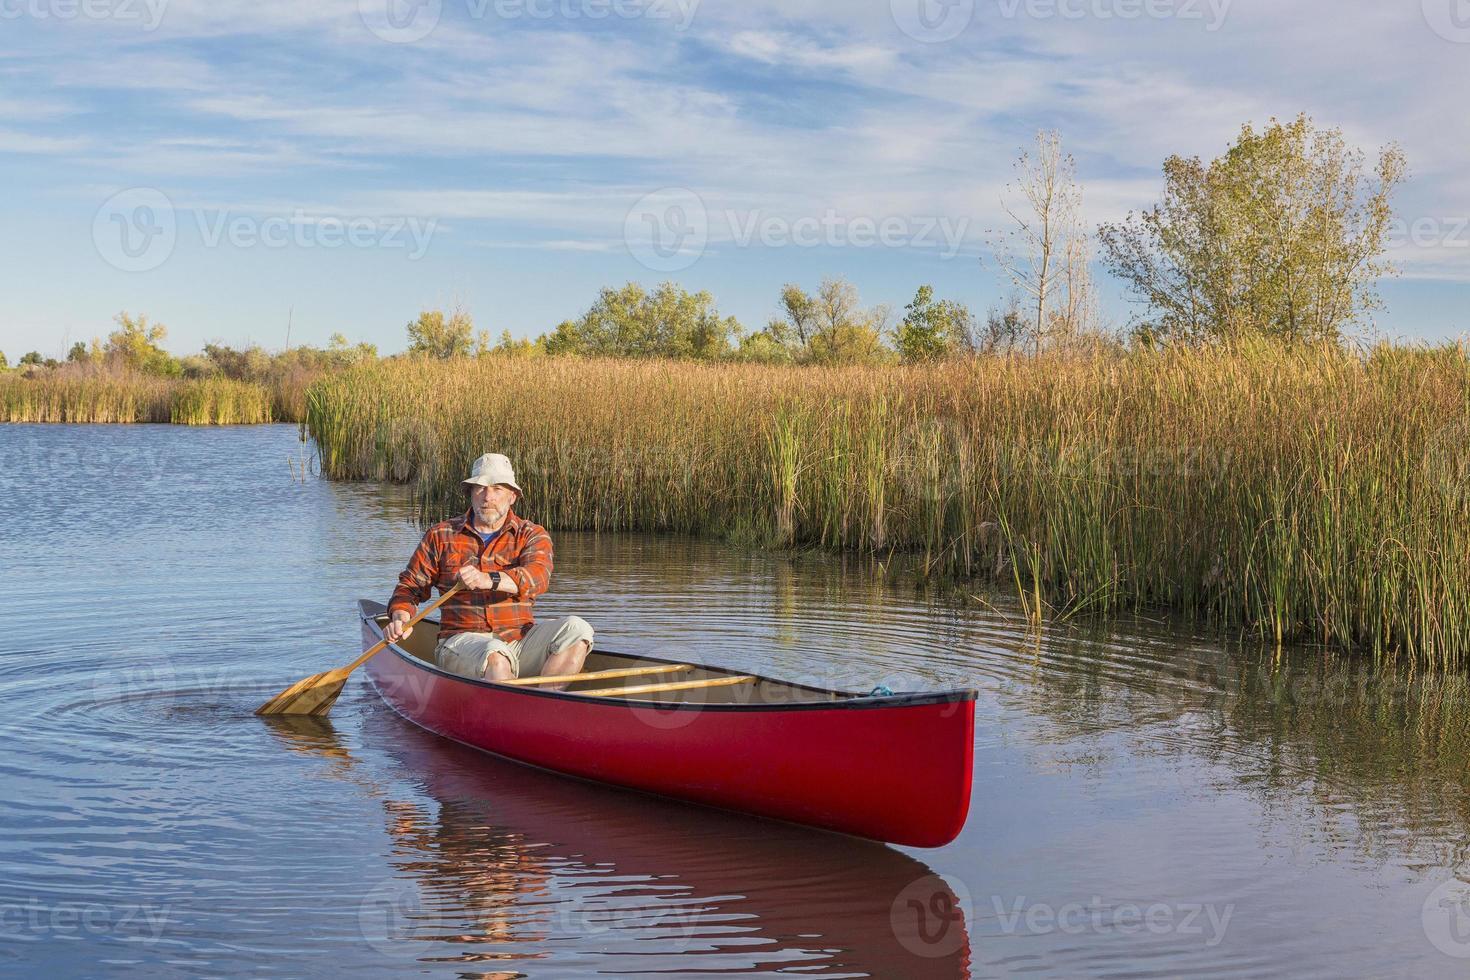 tarde canoa remando foto